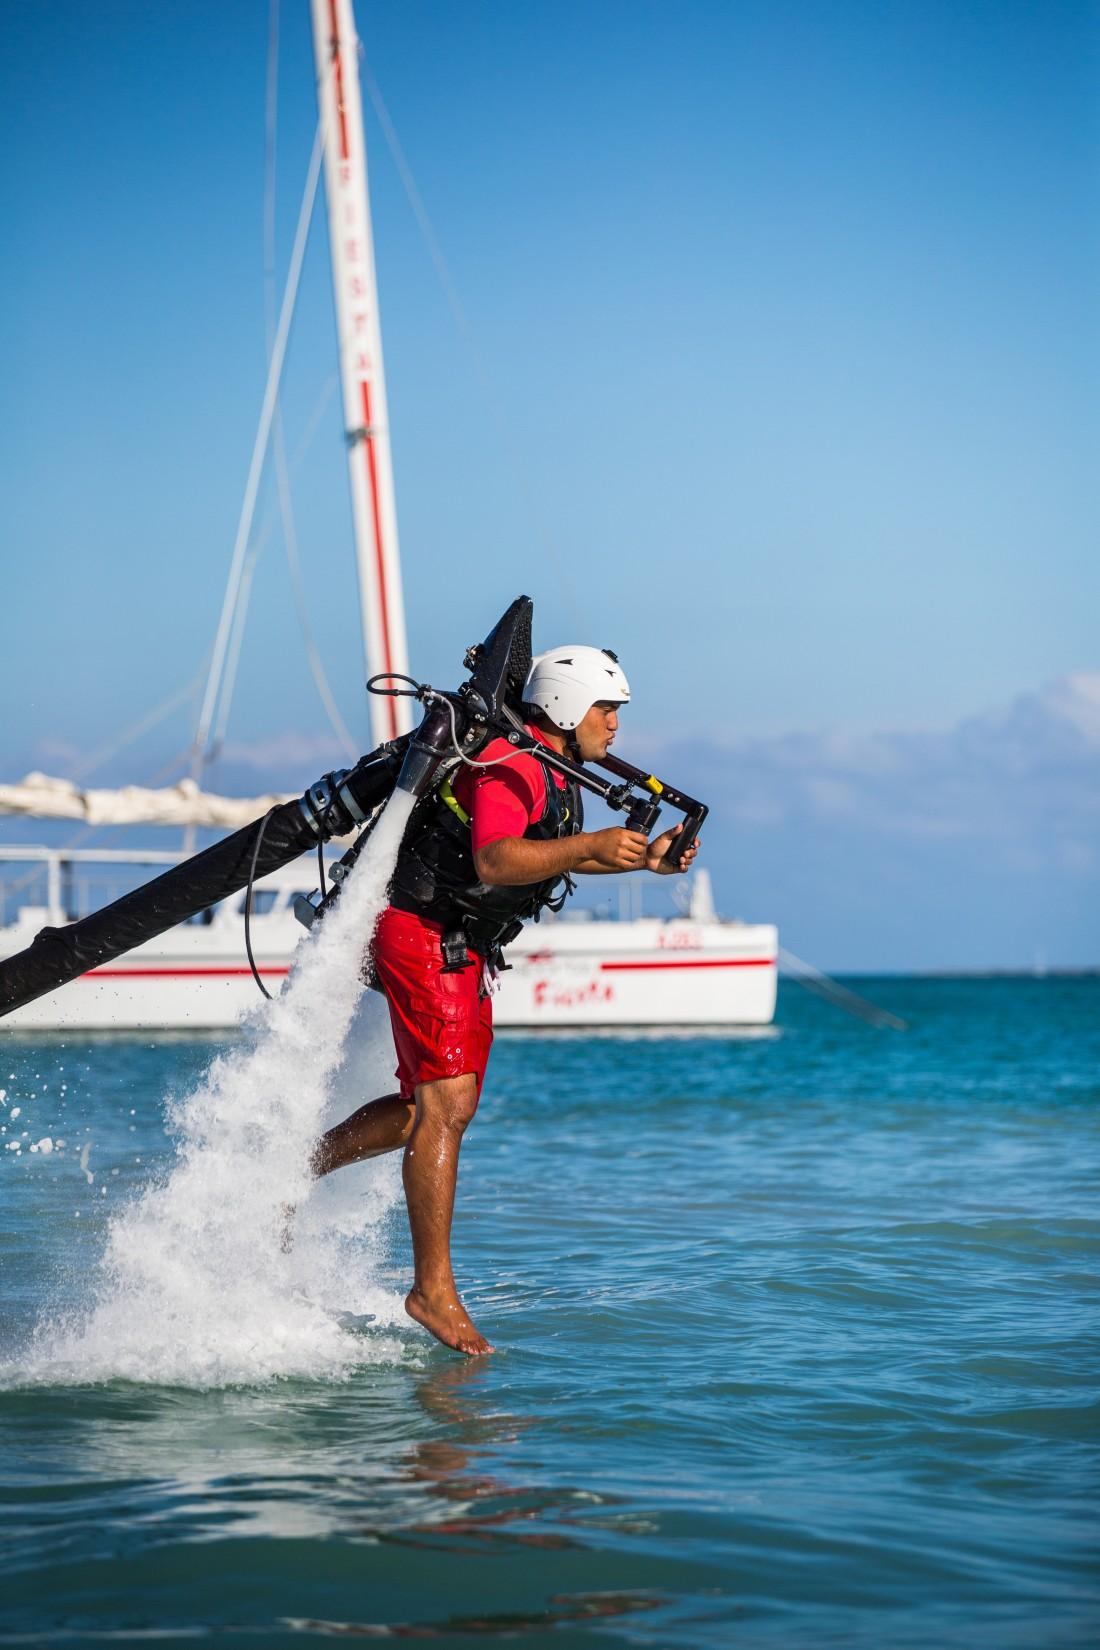 Jetlev-jetpack-royal-caribbean